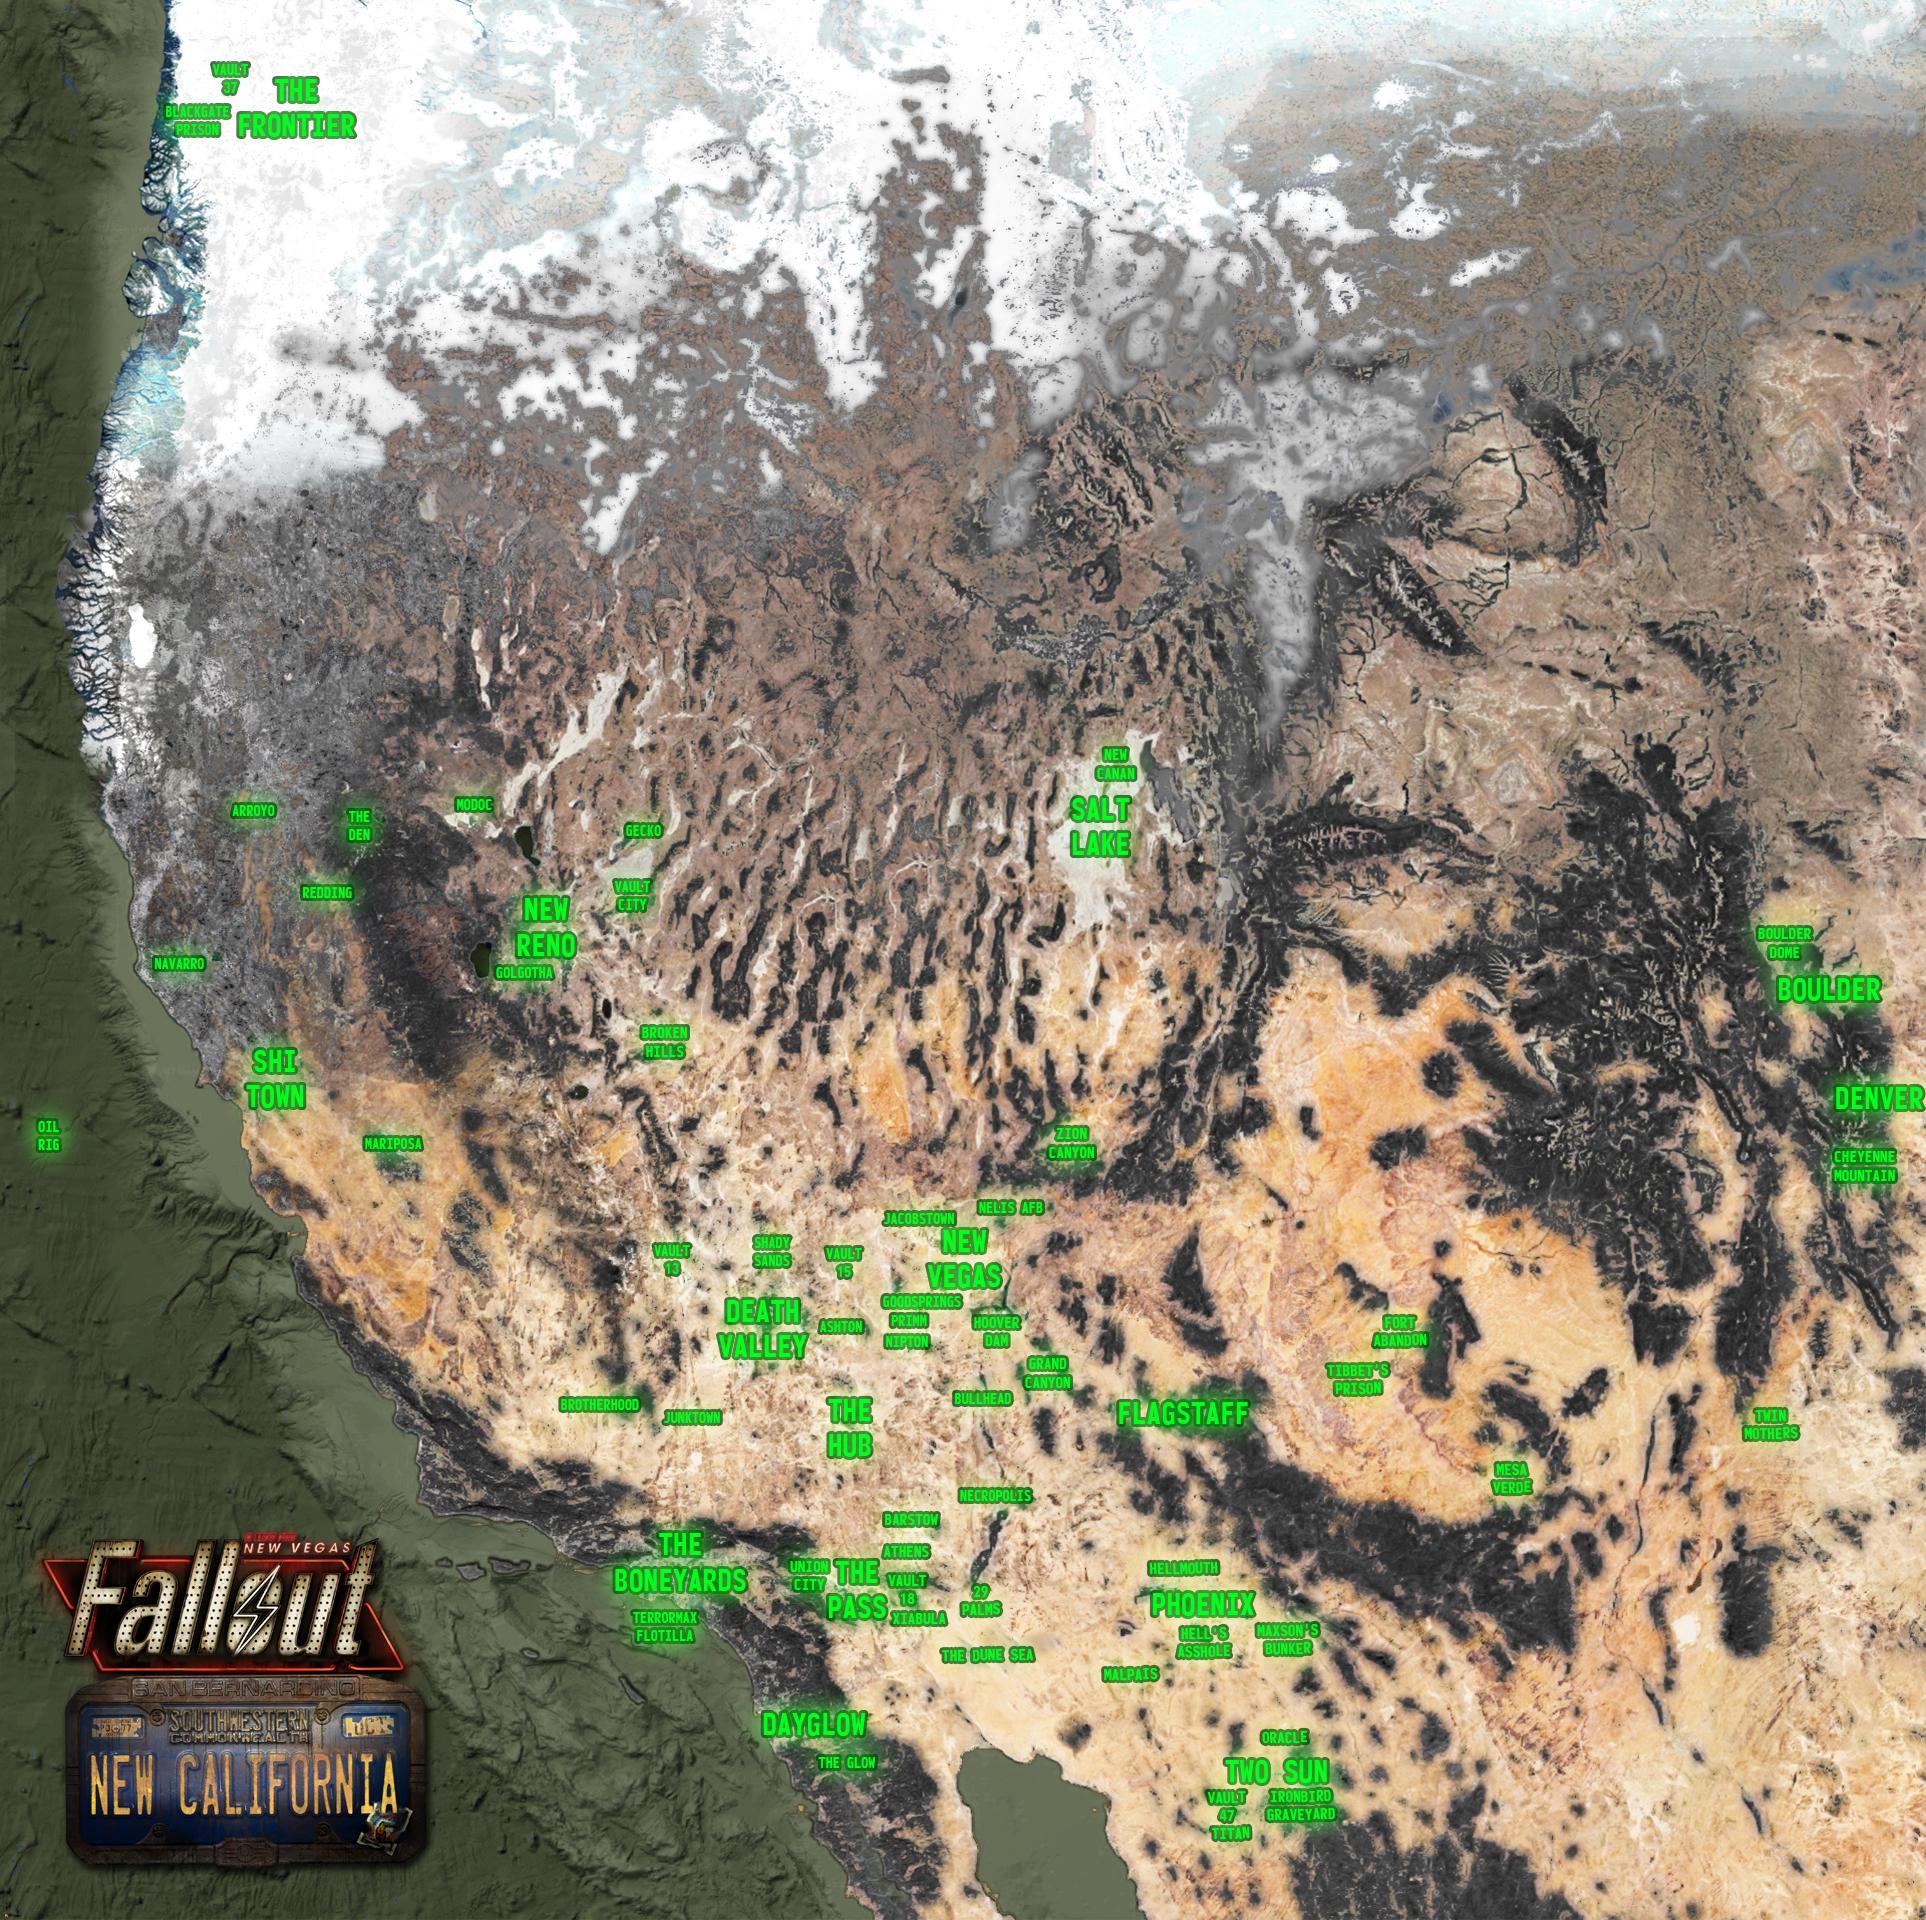 Fallout: New California | No Mutants Allowed